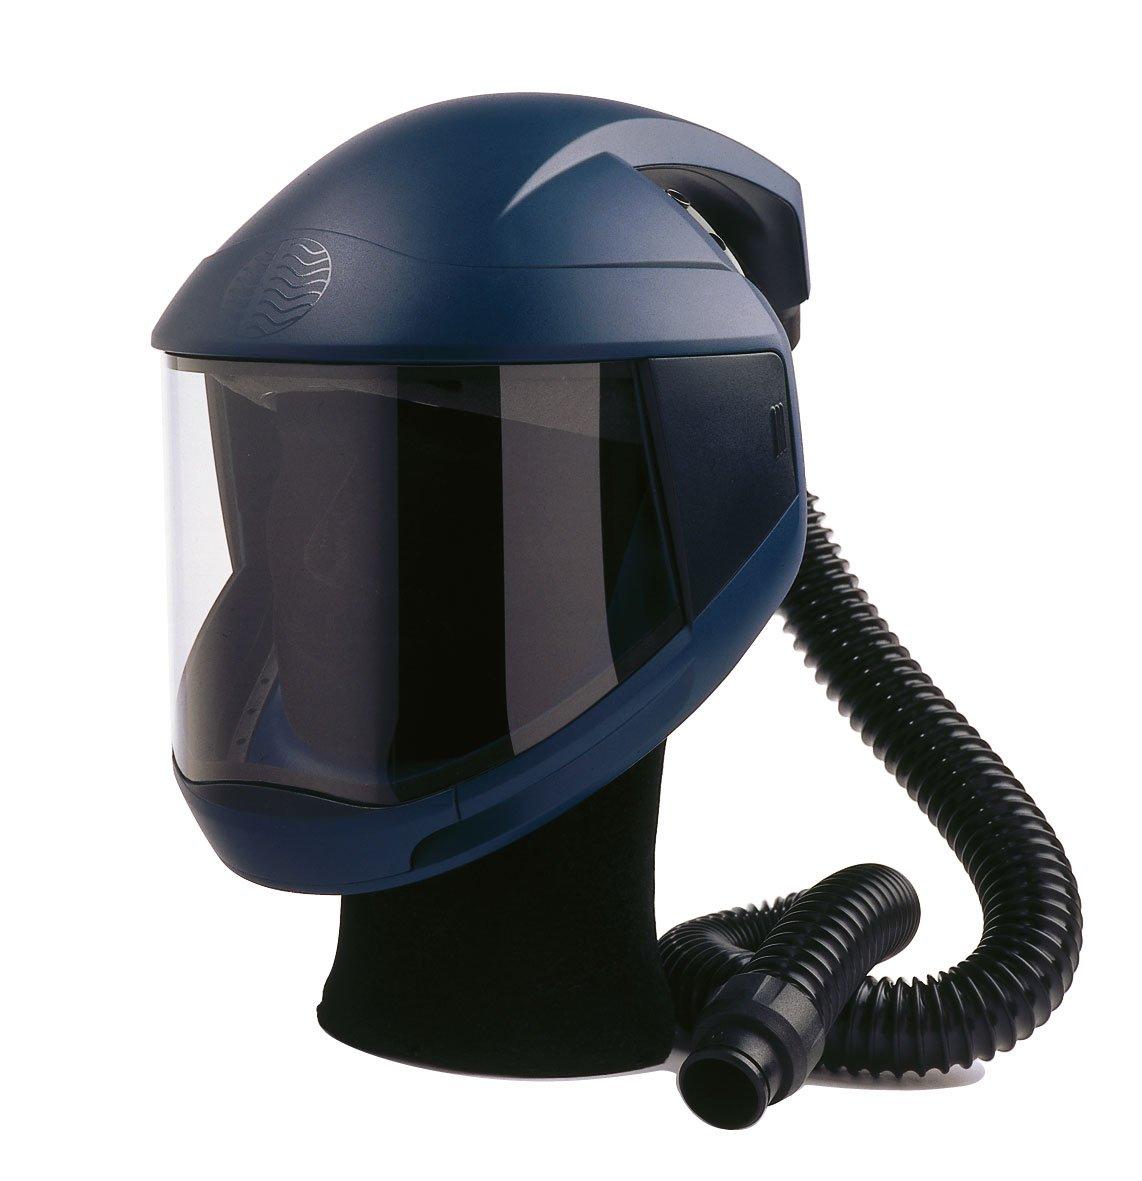 Blue Sundstrom Safety H06-0521 One Size Sundstr/öm SR 540 Loose-Fitting Face Shield